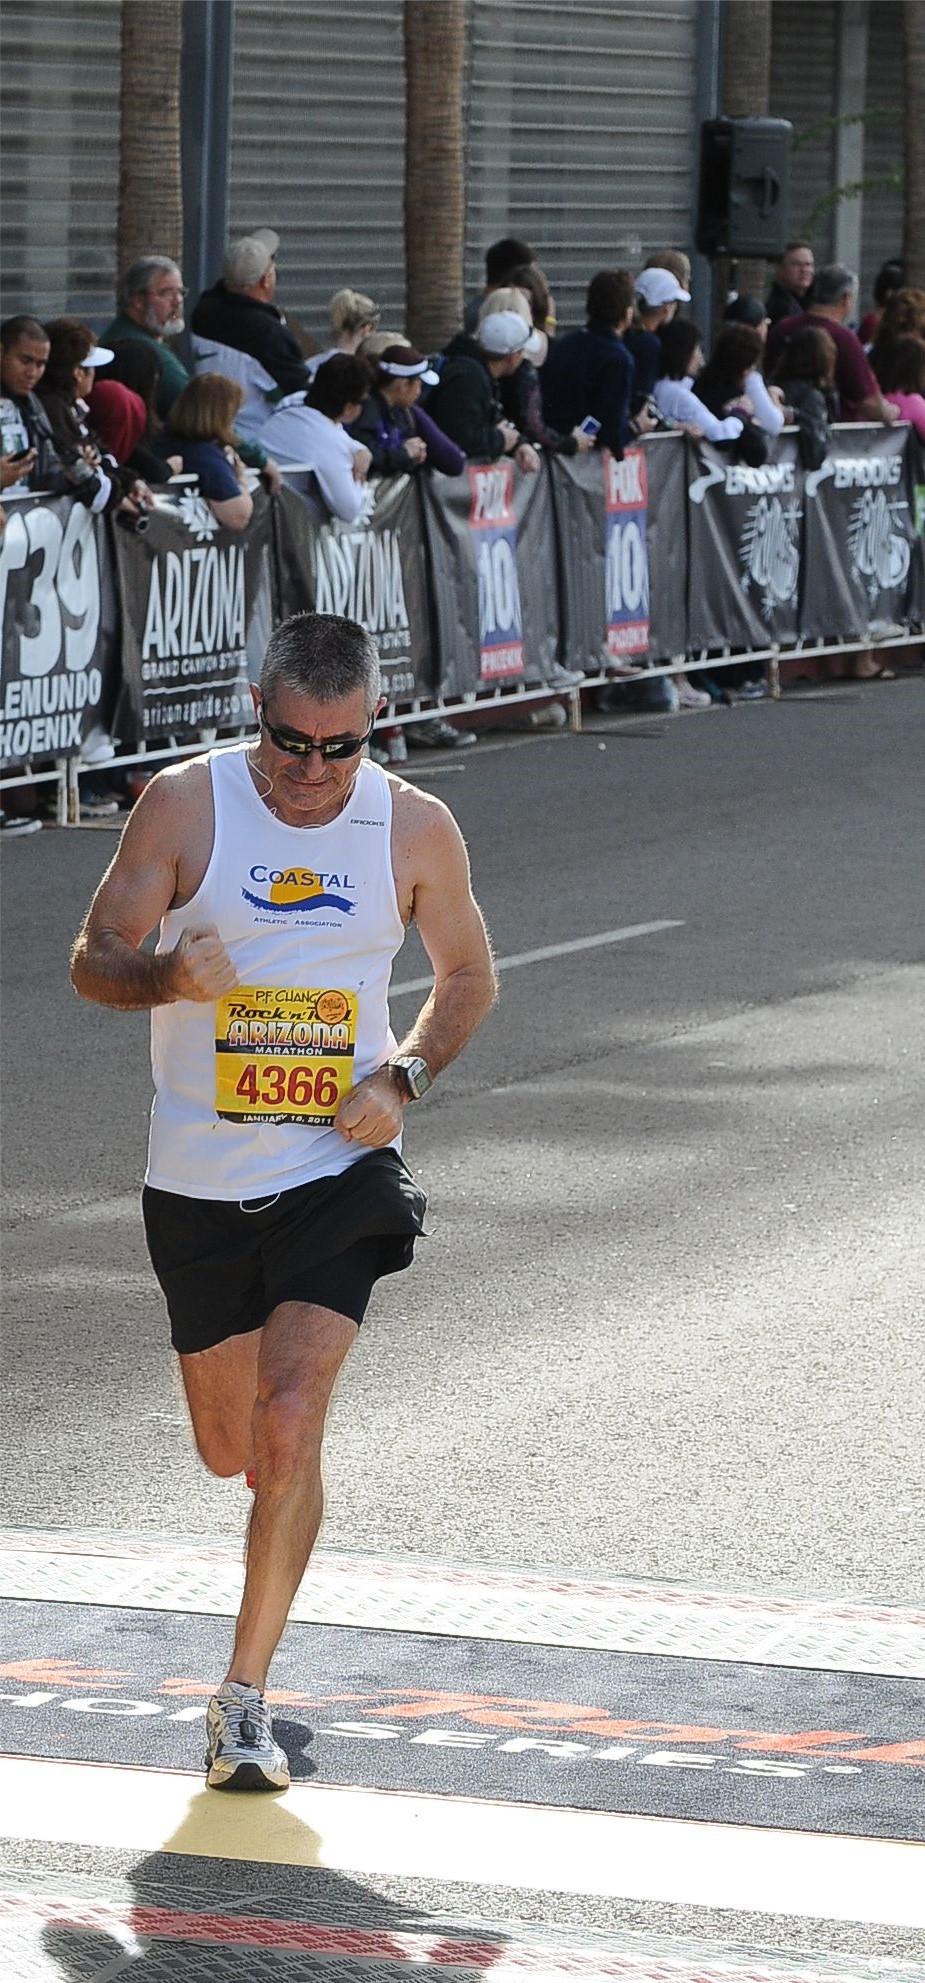 Dave Dulong runs qualifying time for Boston marathon